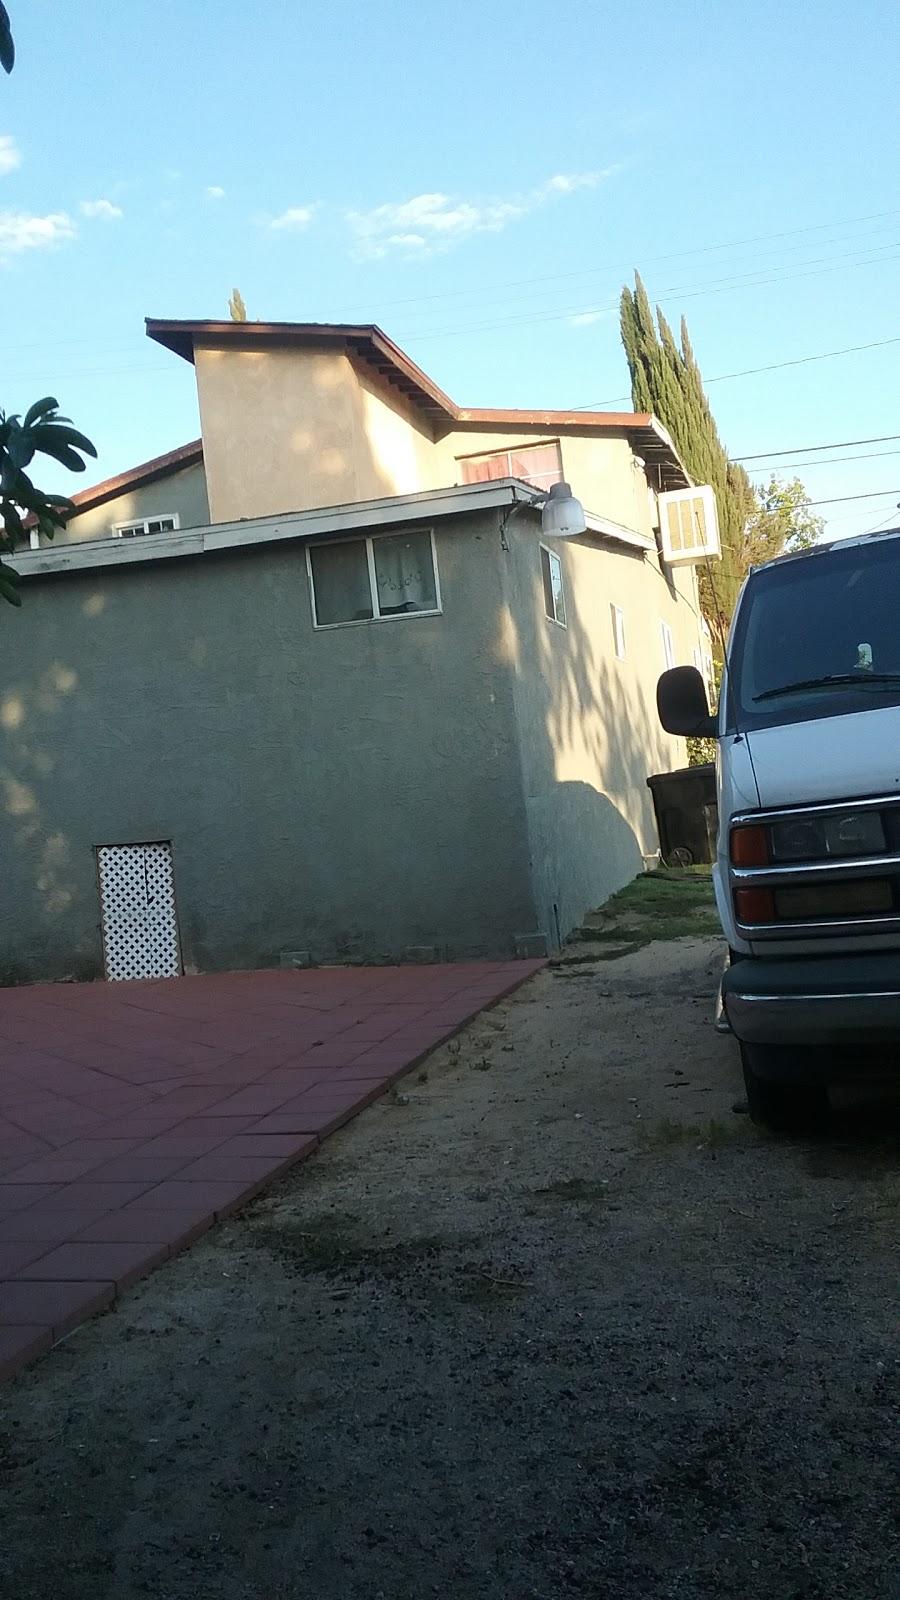 Church of God Seventh Day Word - church    Photo 2 of 2   Address: 3441 Rubidoux Blvd, Riverside, CA 92509, USA   Phone: (951) 774-3056